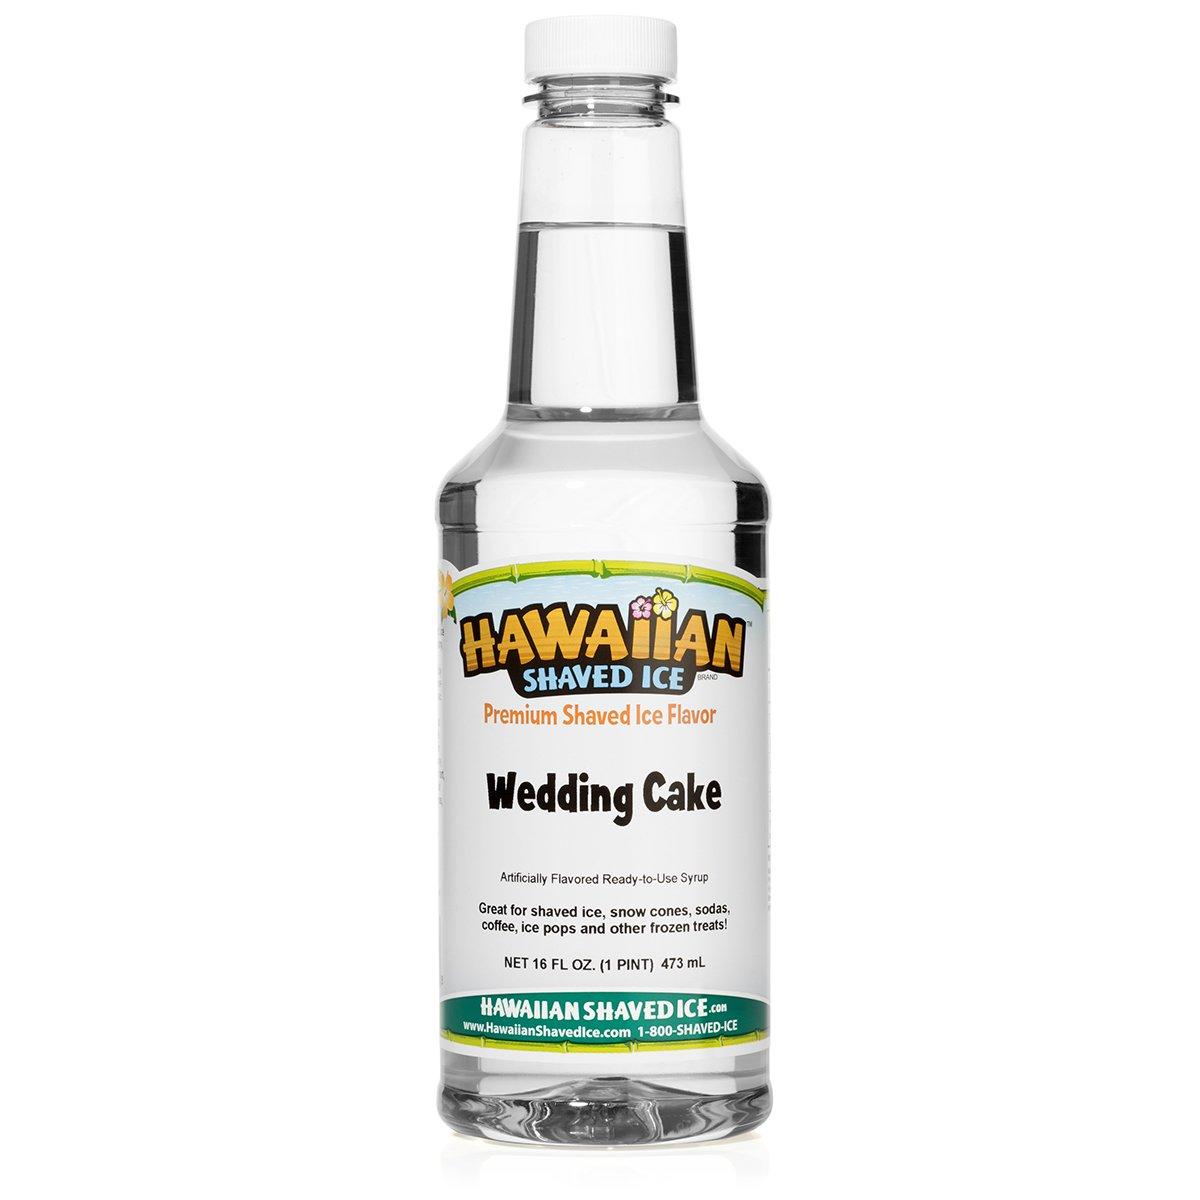 Hawaiian Shaved Ice Wedding Cake Snow Cone Syrup, 1 Pint